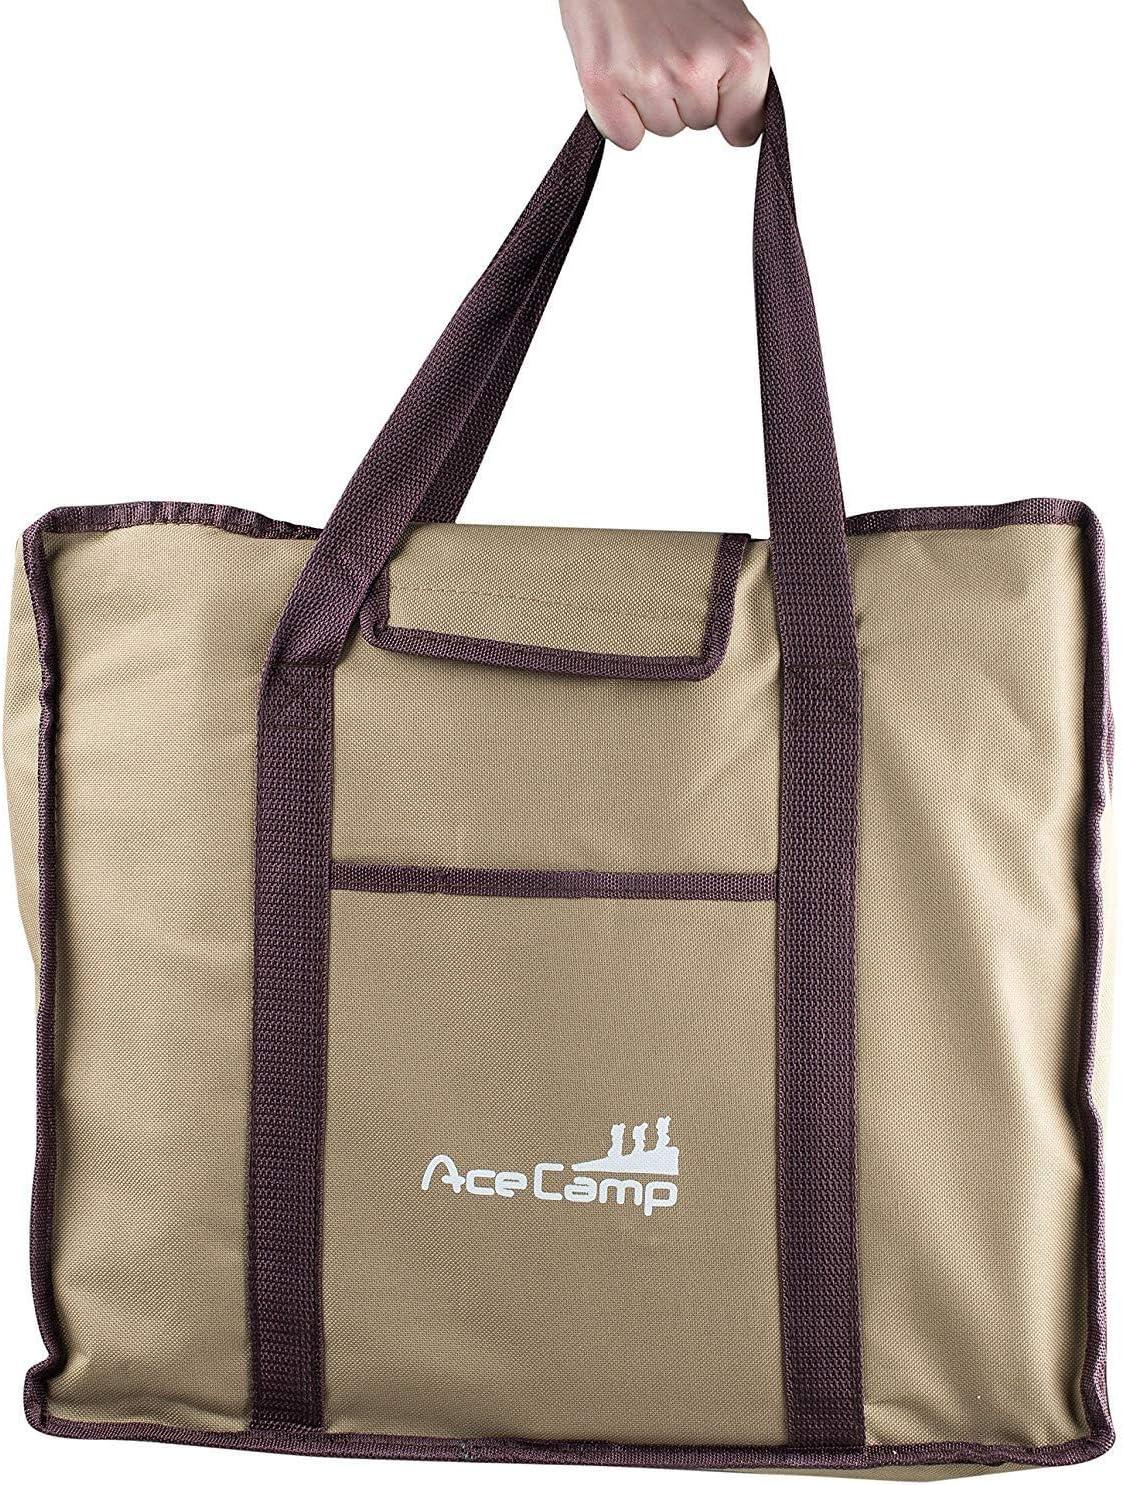 AceCamp Barbecue de camping, charbon de bois, barbecue portable pliable en acier inoxydable, autres tailles Small 21,5 X 19 X 16,5 Cm.